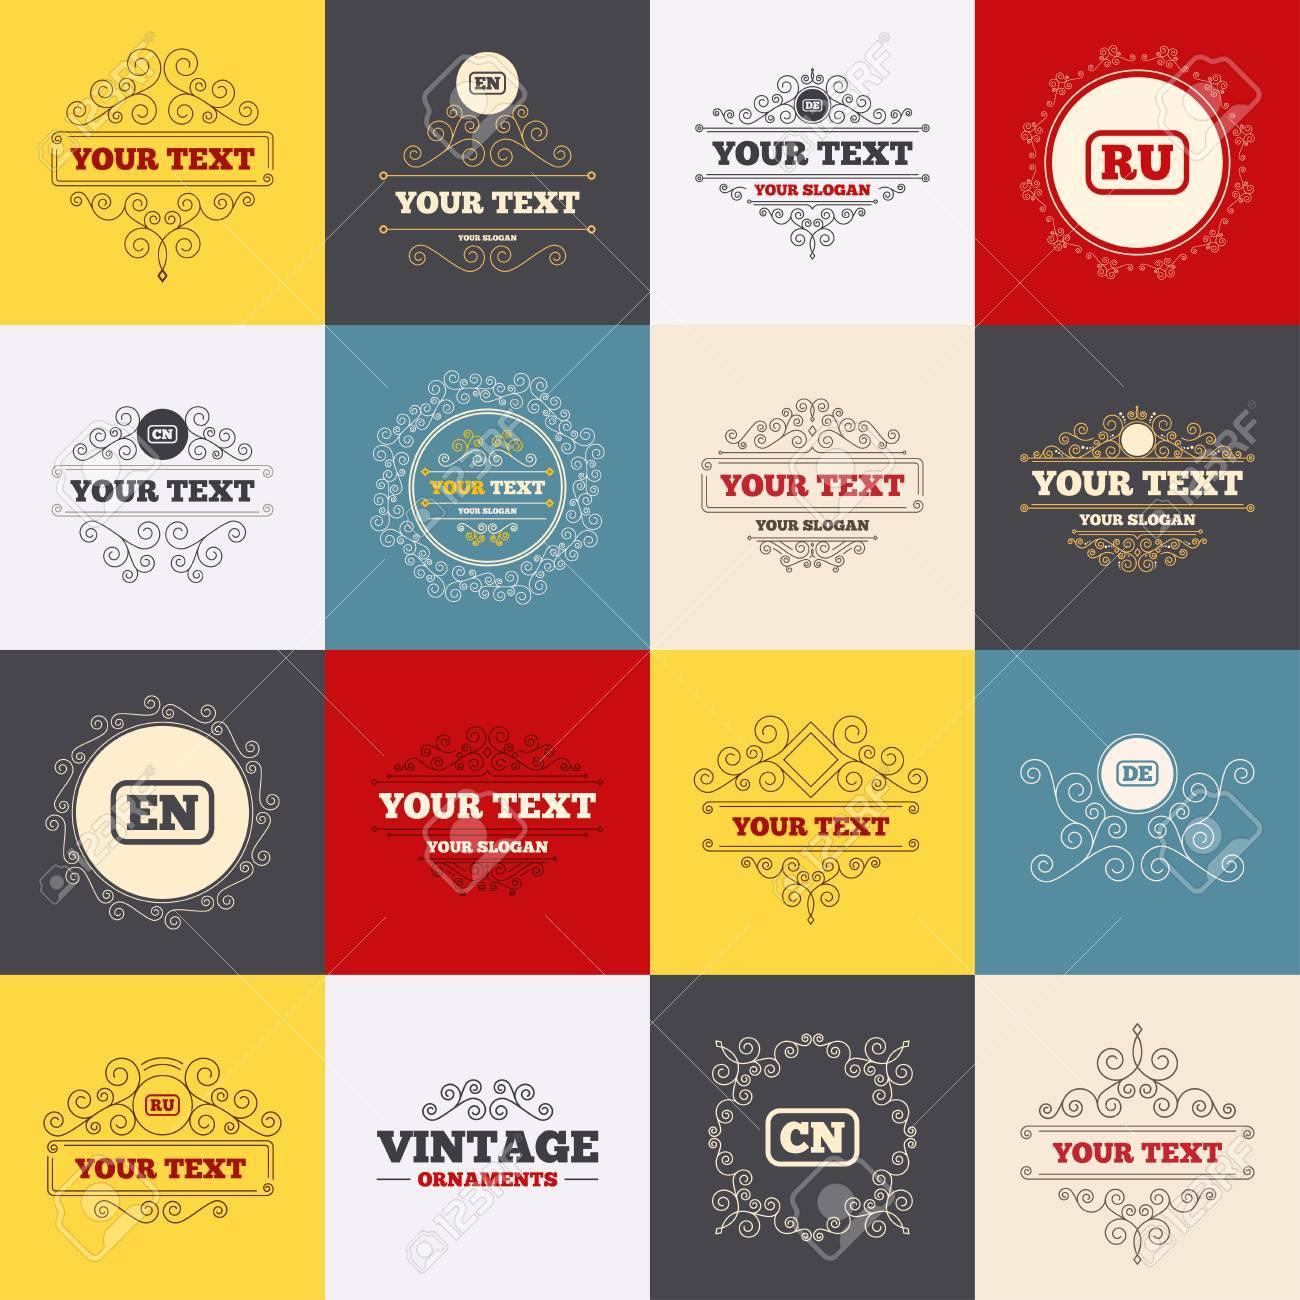 Vintage-Rahmen, Etiketten. Sprache Symbole. EN, DE, RU Und Symbole ...